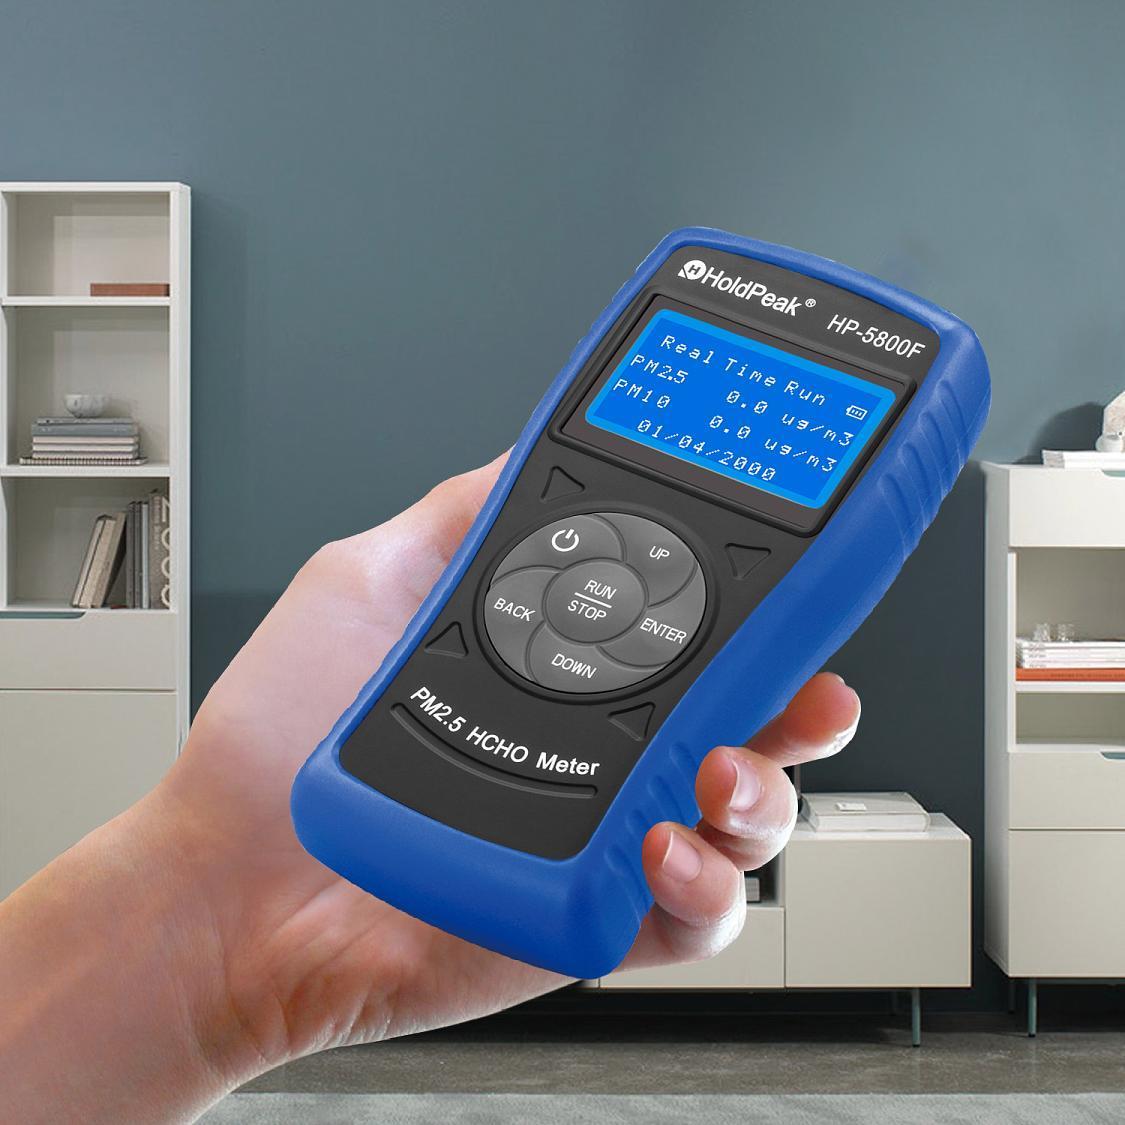 formaldehyde detector Formaldehyde(HCHO) Tester, PM2.5 formaldehyde detector HP-5800F